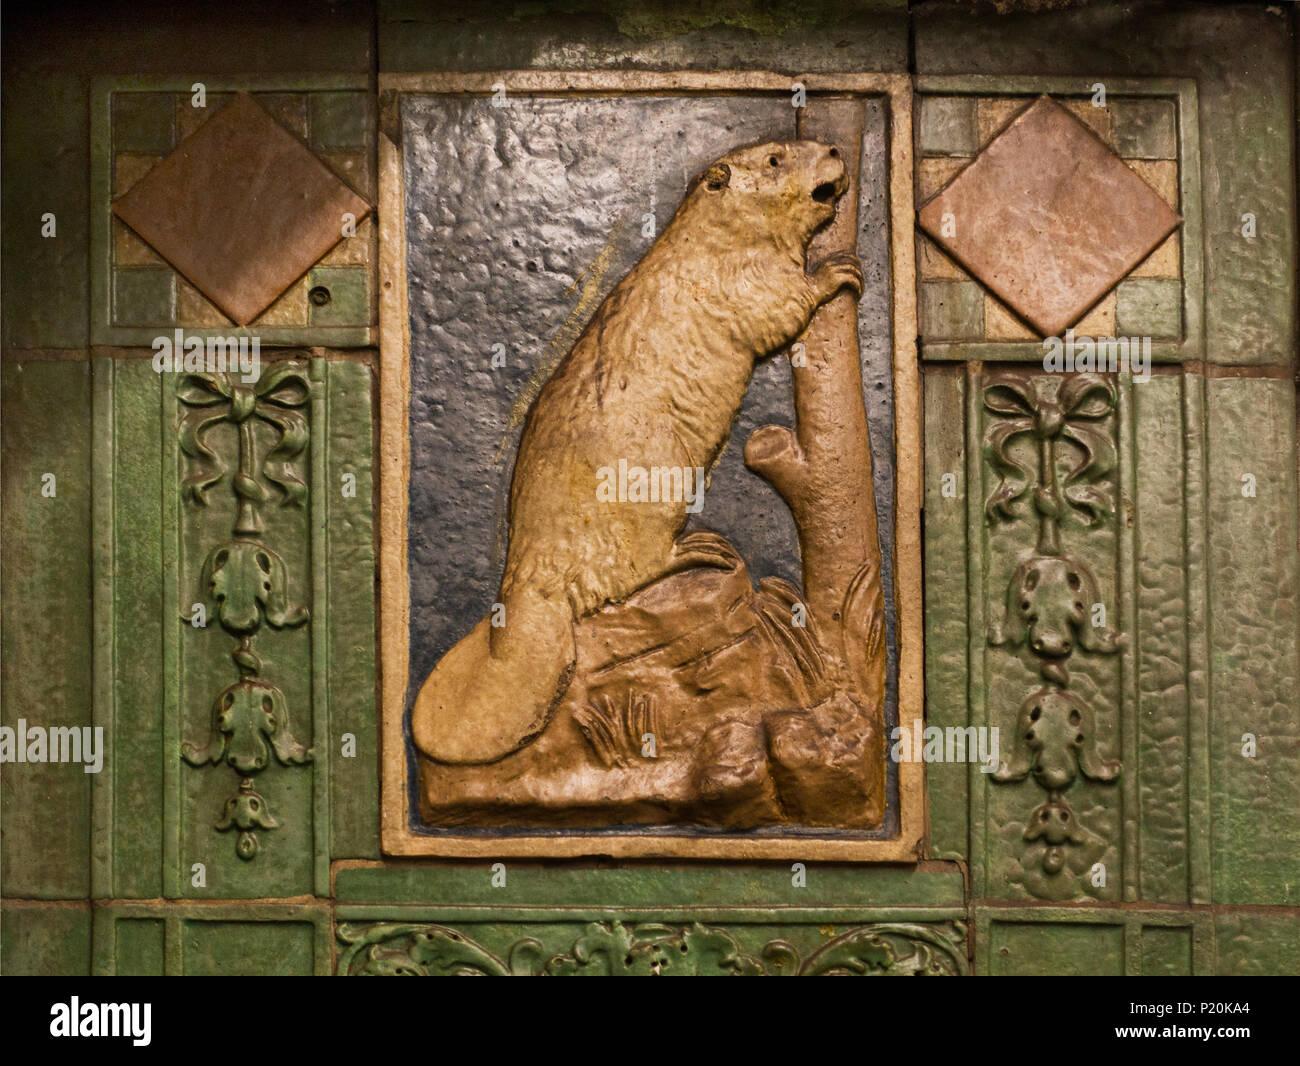 Beaver Subway Tile At Astor Place Manhattan Nyc Stock Photo